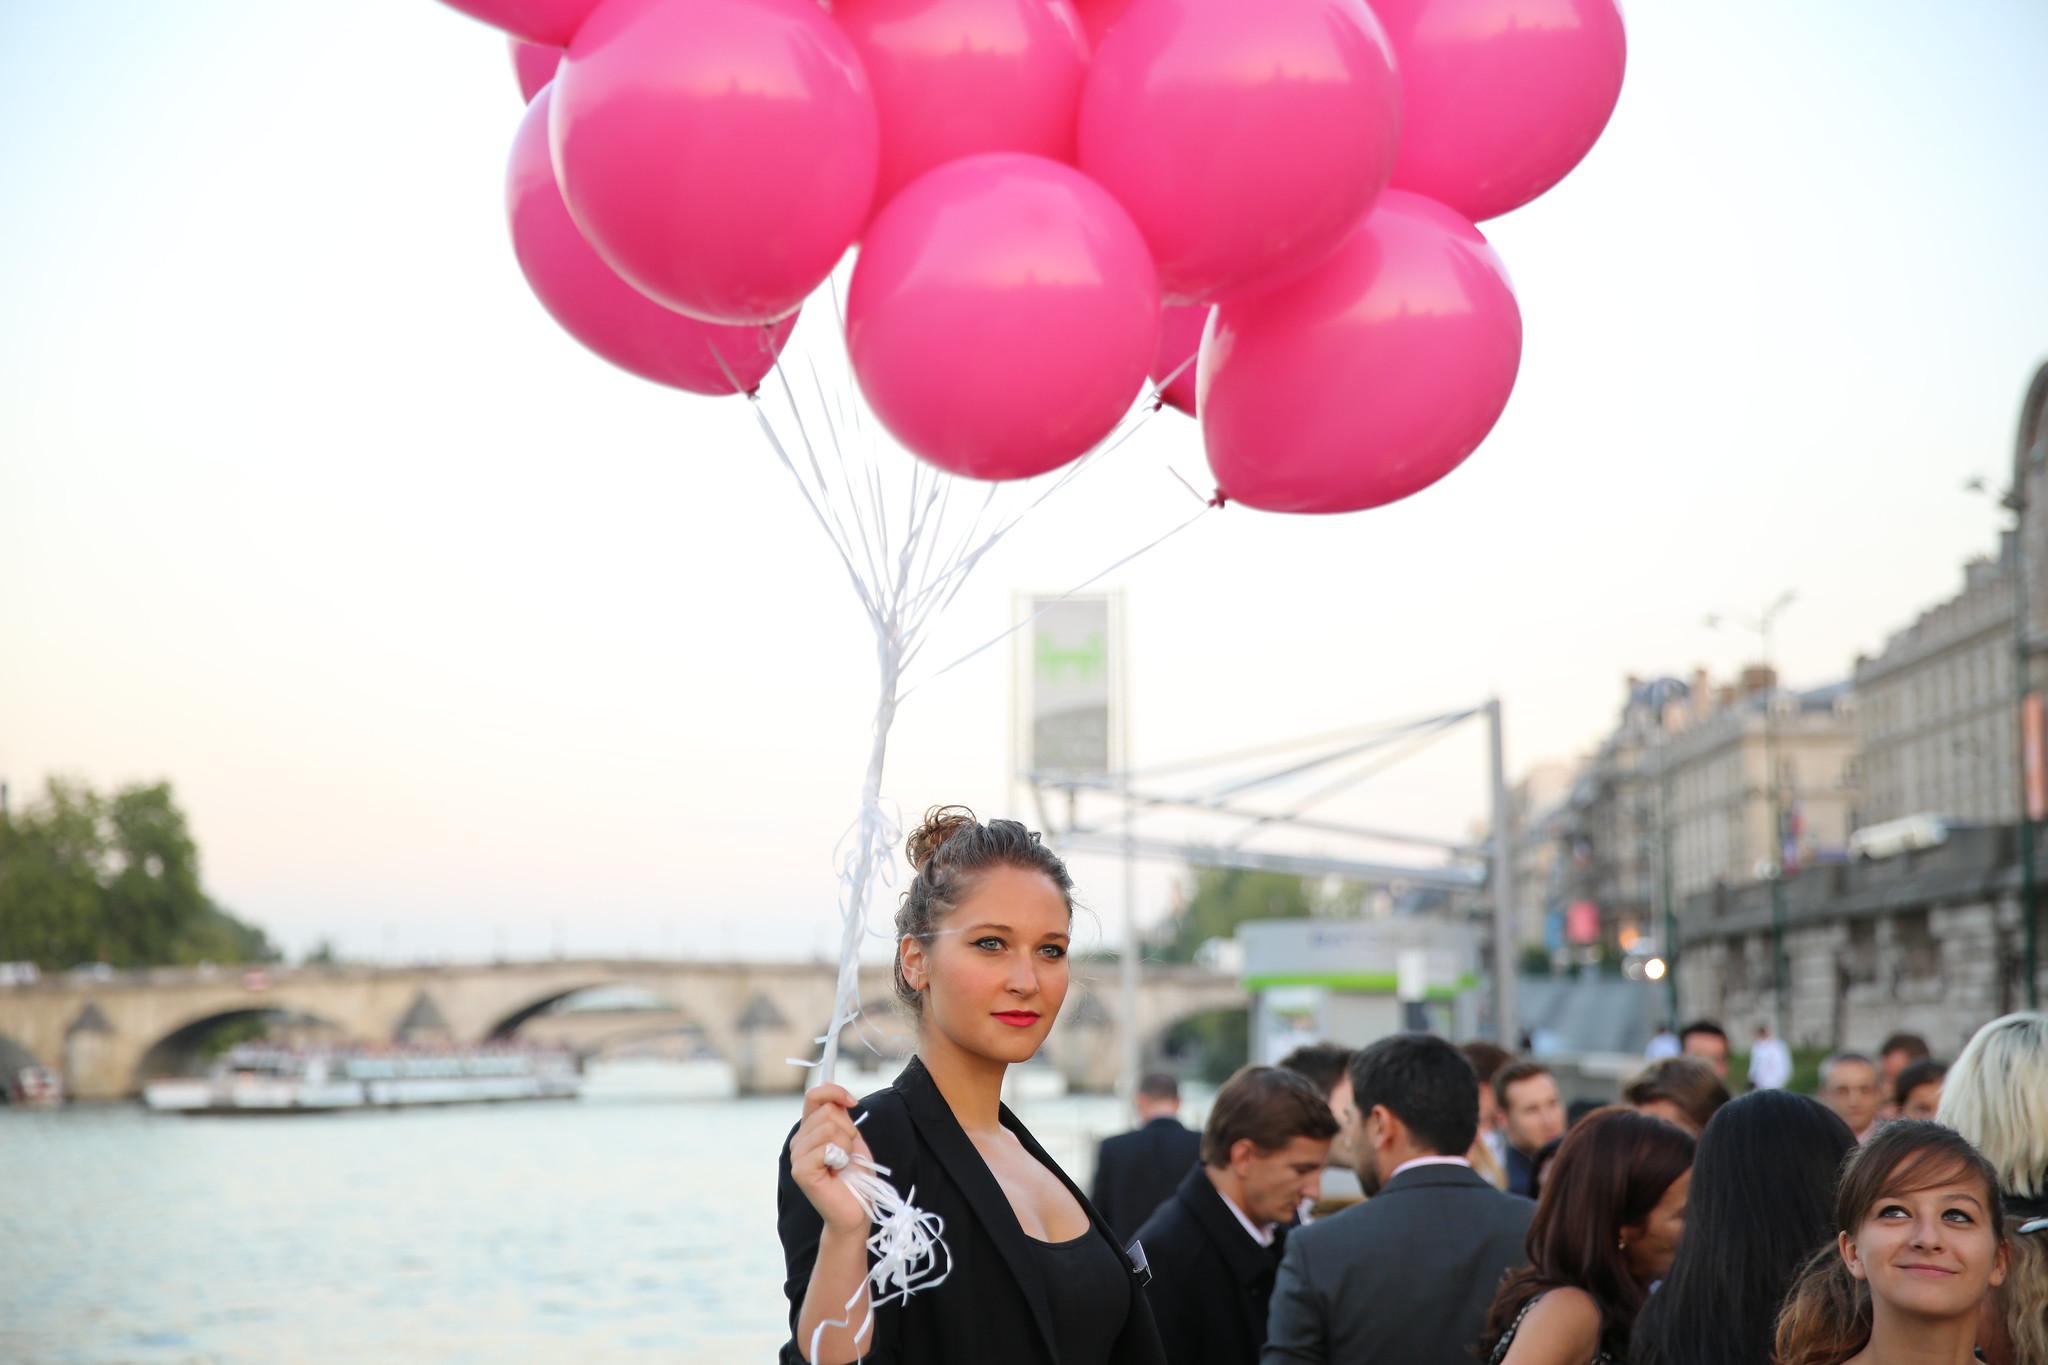 Voyage Privé's 10th anniversary party : Secret Night in Paris